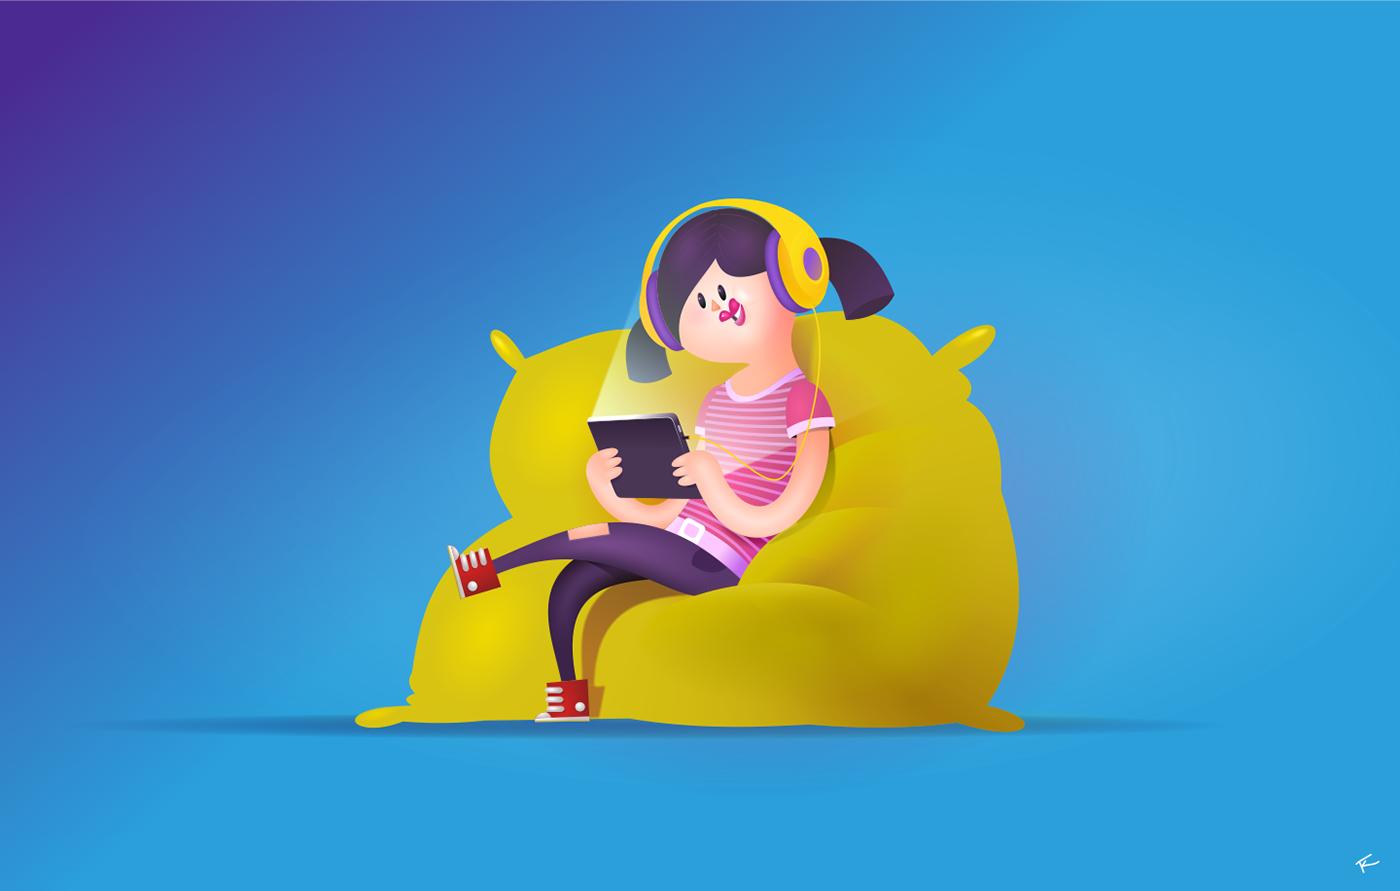 DIGI.TV - campagn illustrations